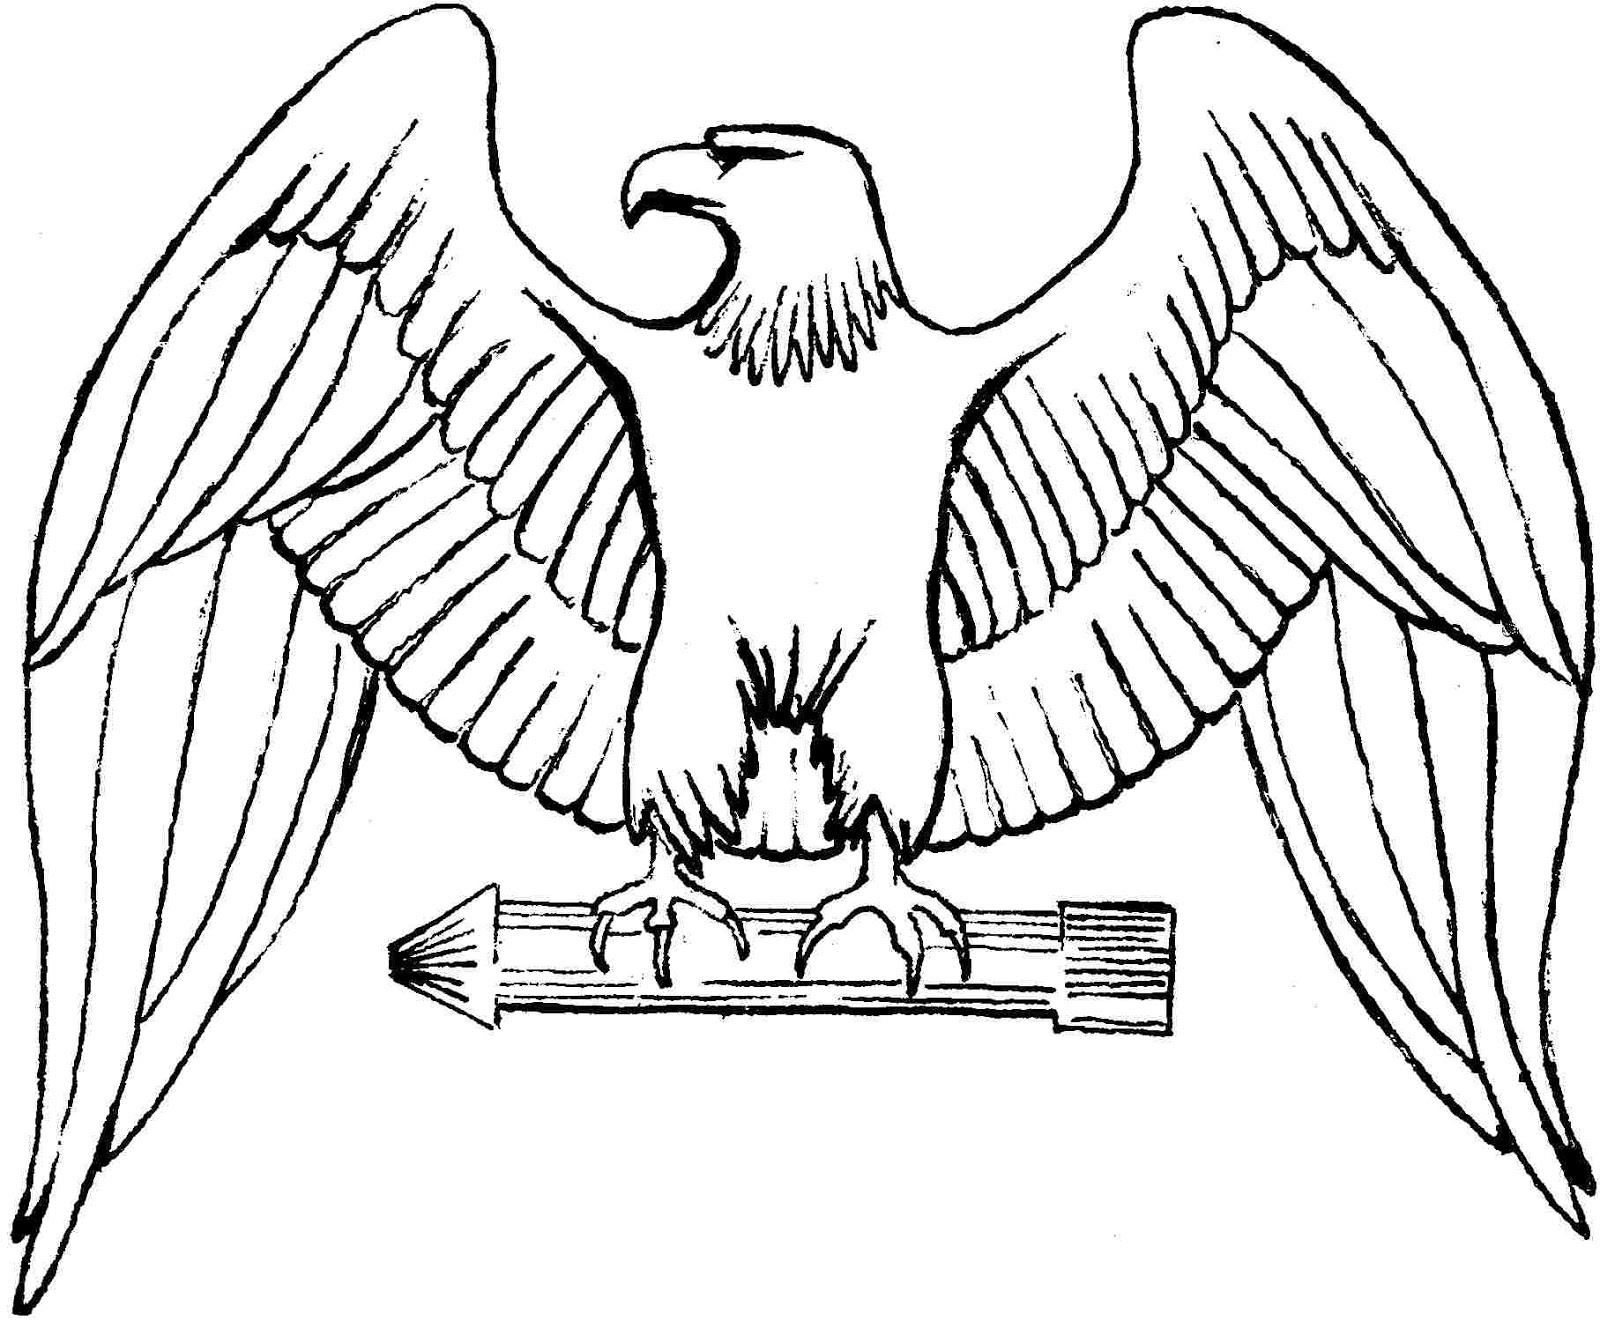 Mewarnai Gambar Mewarnai Gambar Sketsa Garuda Pancasila